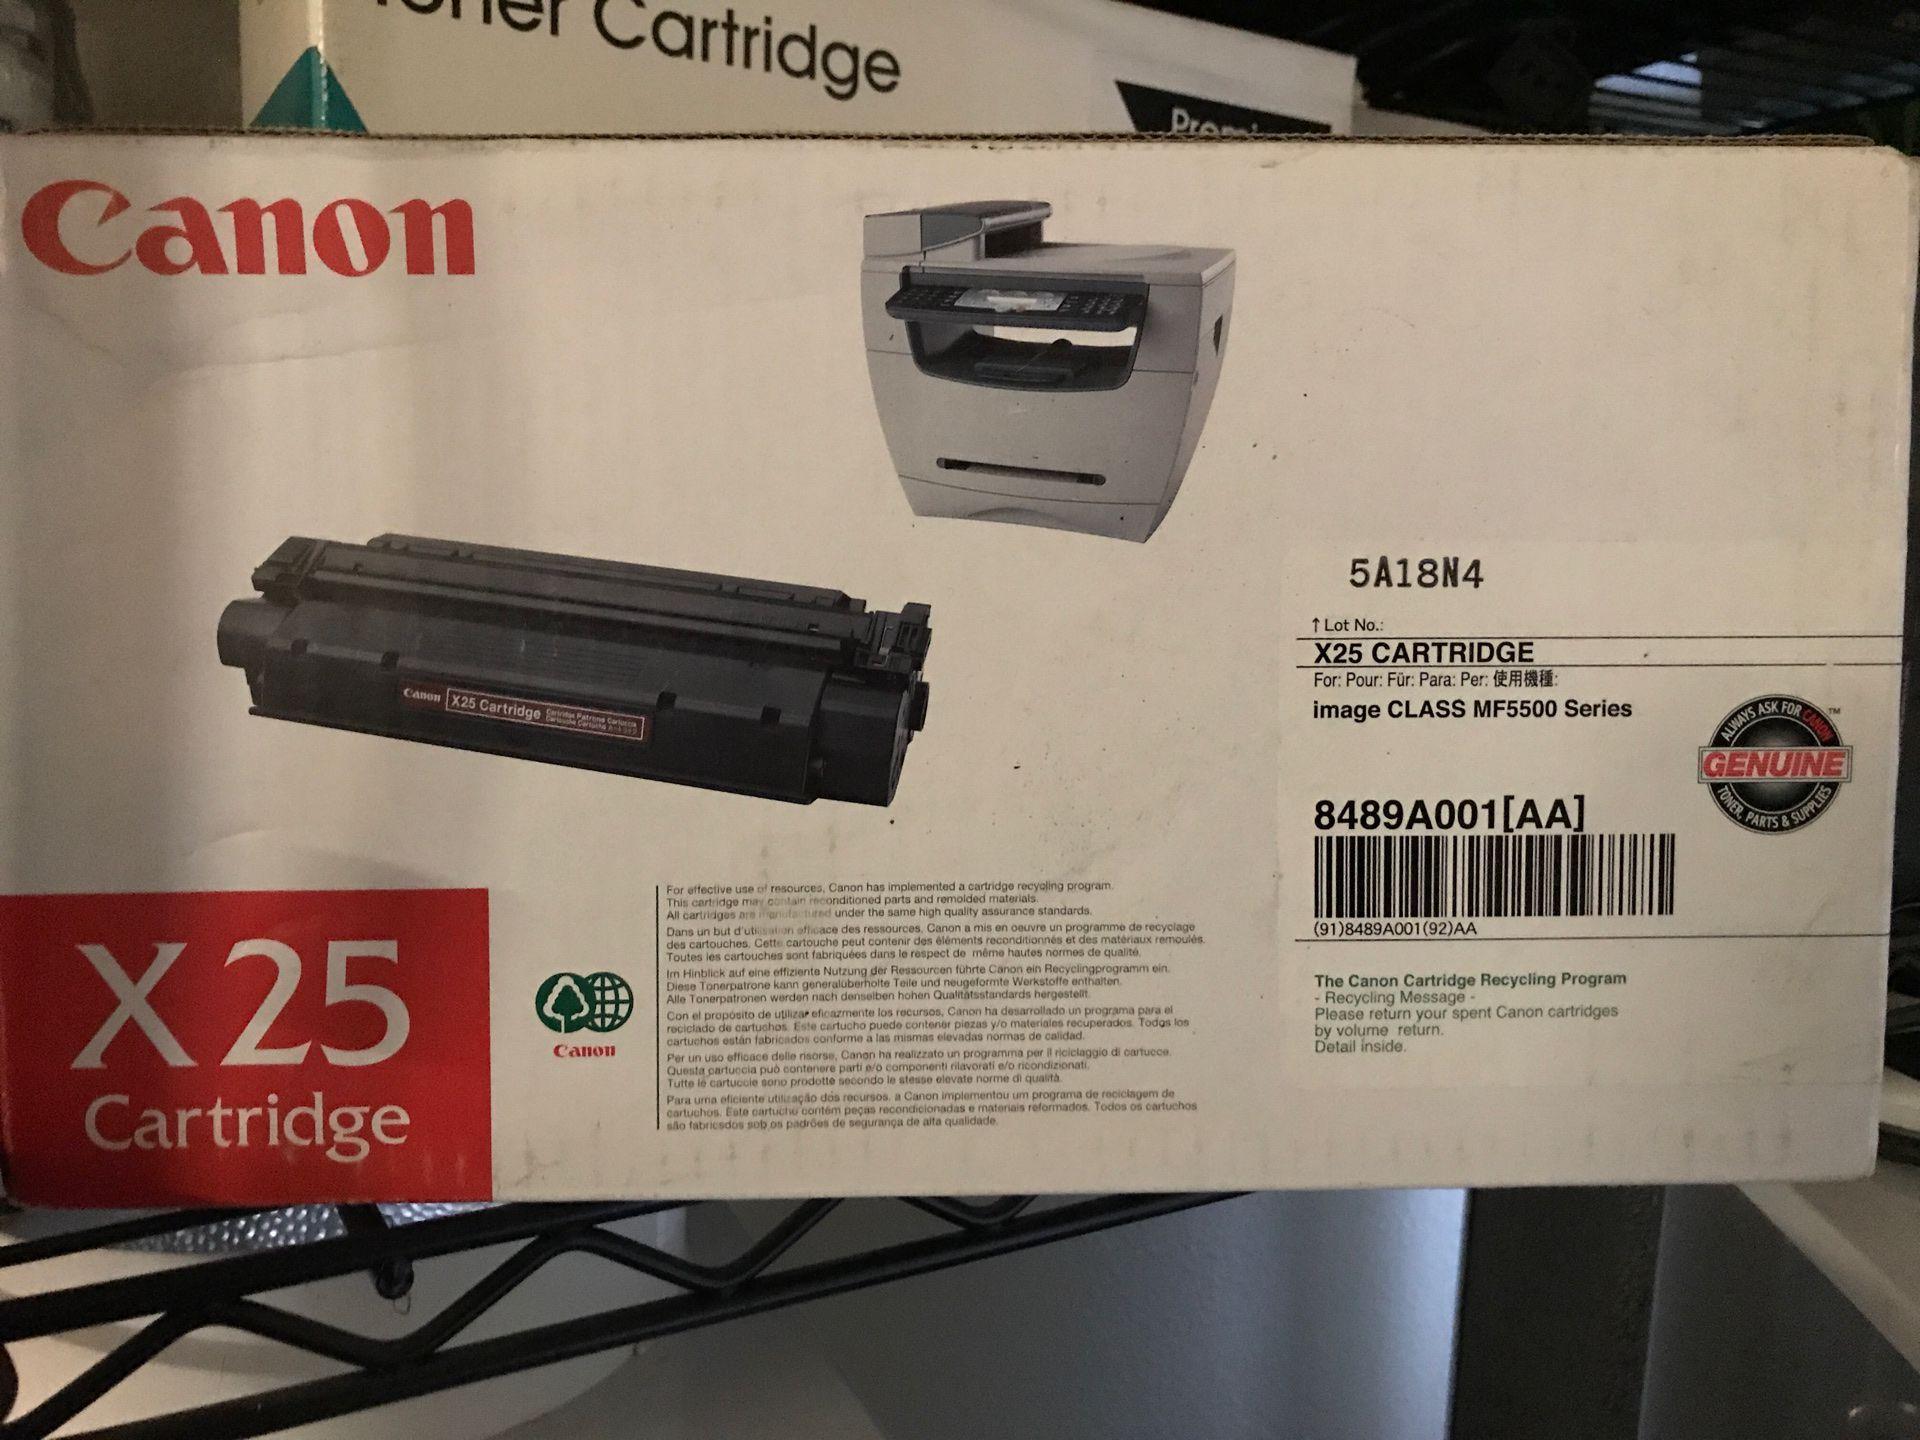 Canon c25 cartridge